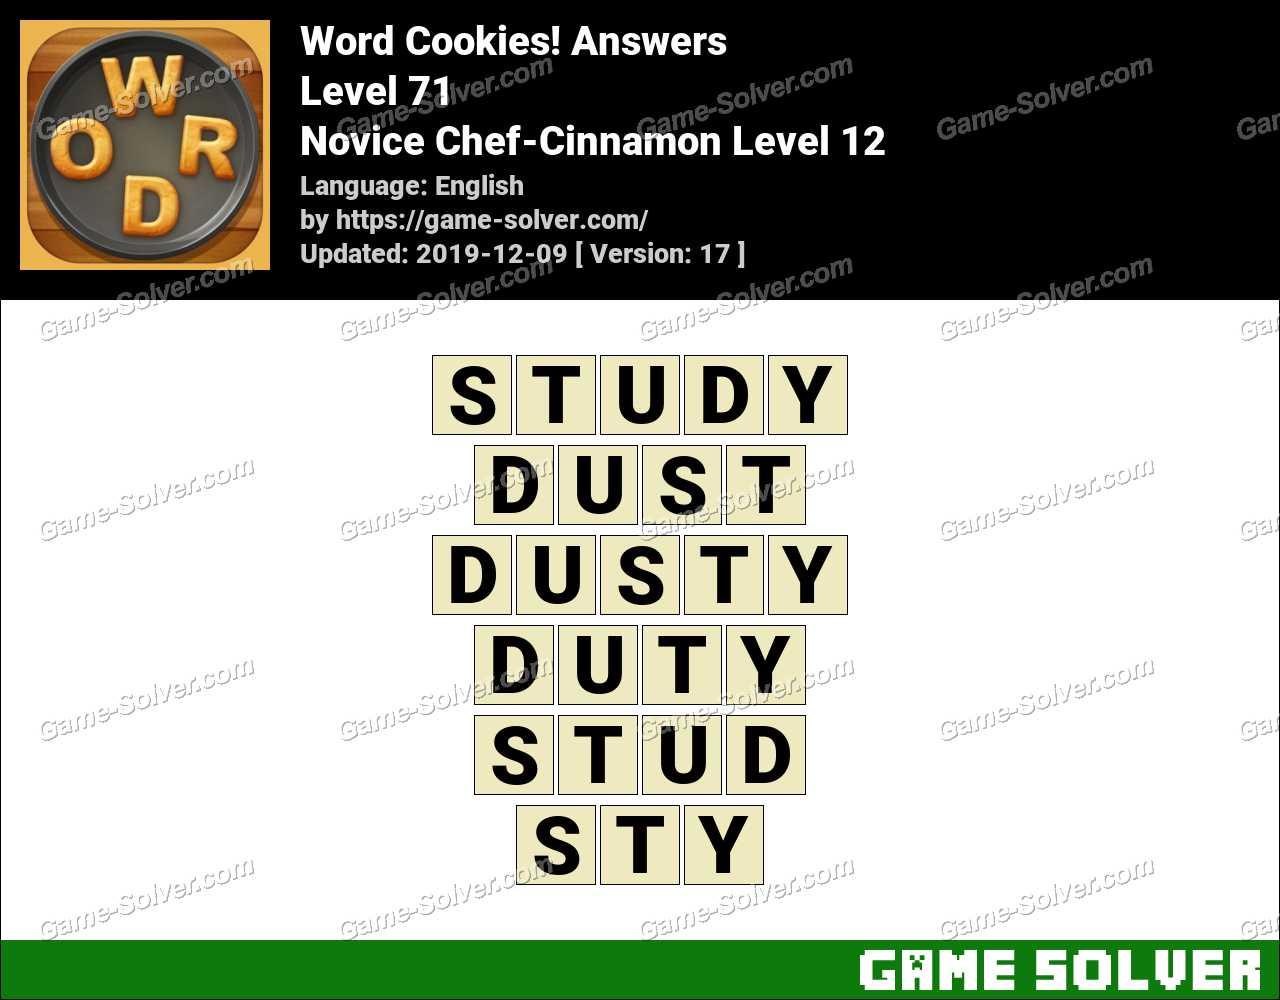 Word Cookies Novice Chef-Cinnamon Level 12 Answers